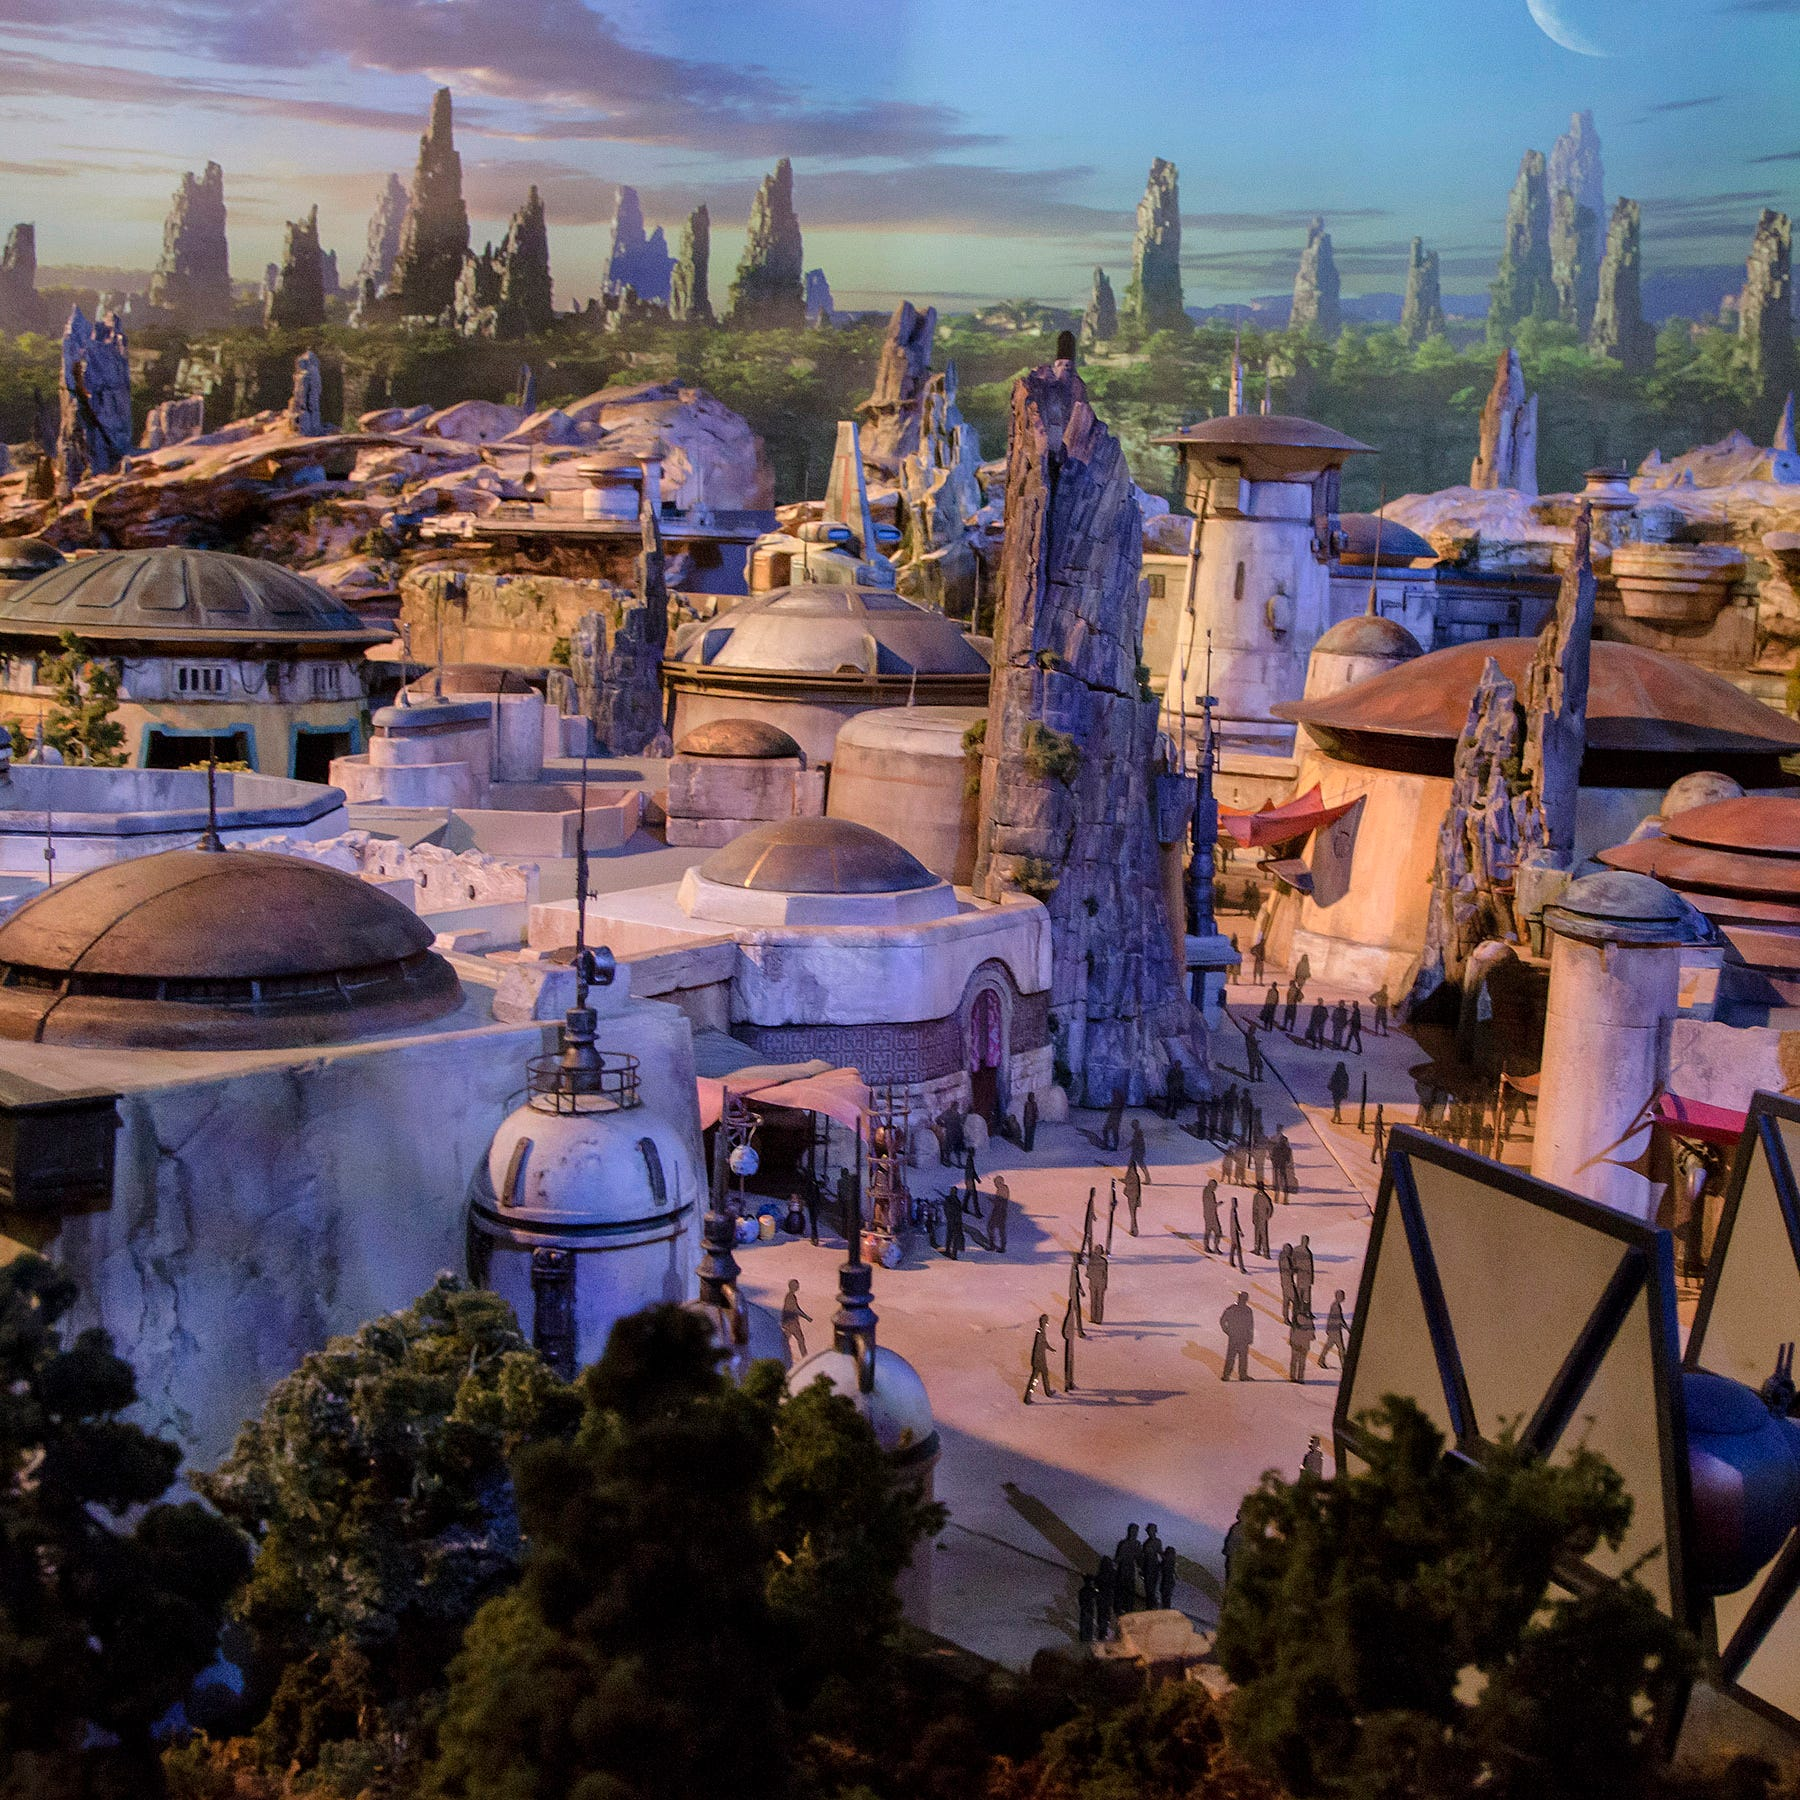 Disneyland will limit stroller sizes before Star Wars: Galaxy's Edge opens